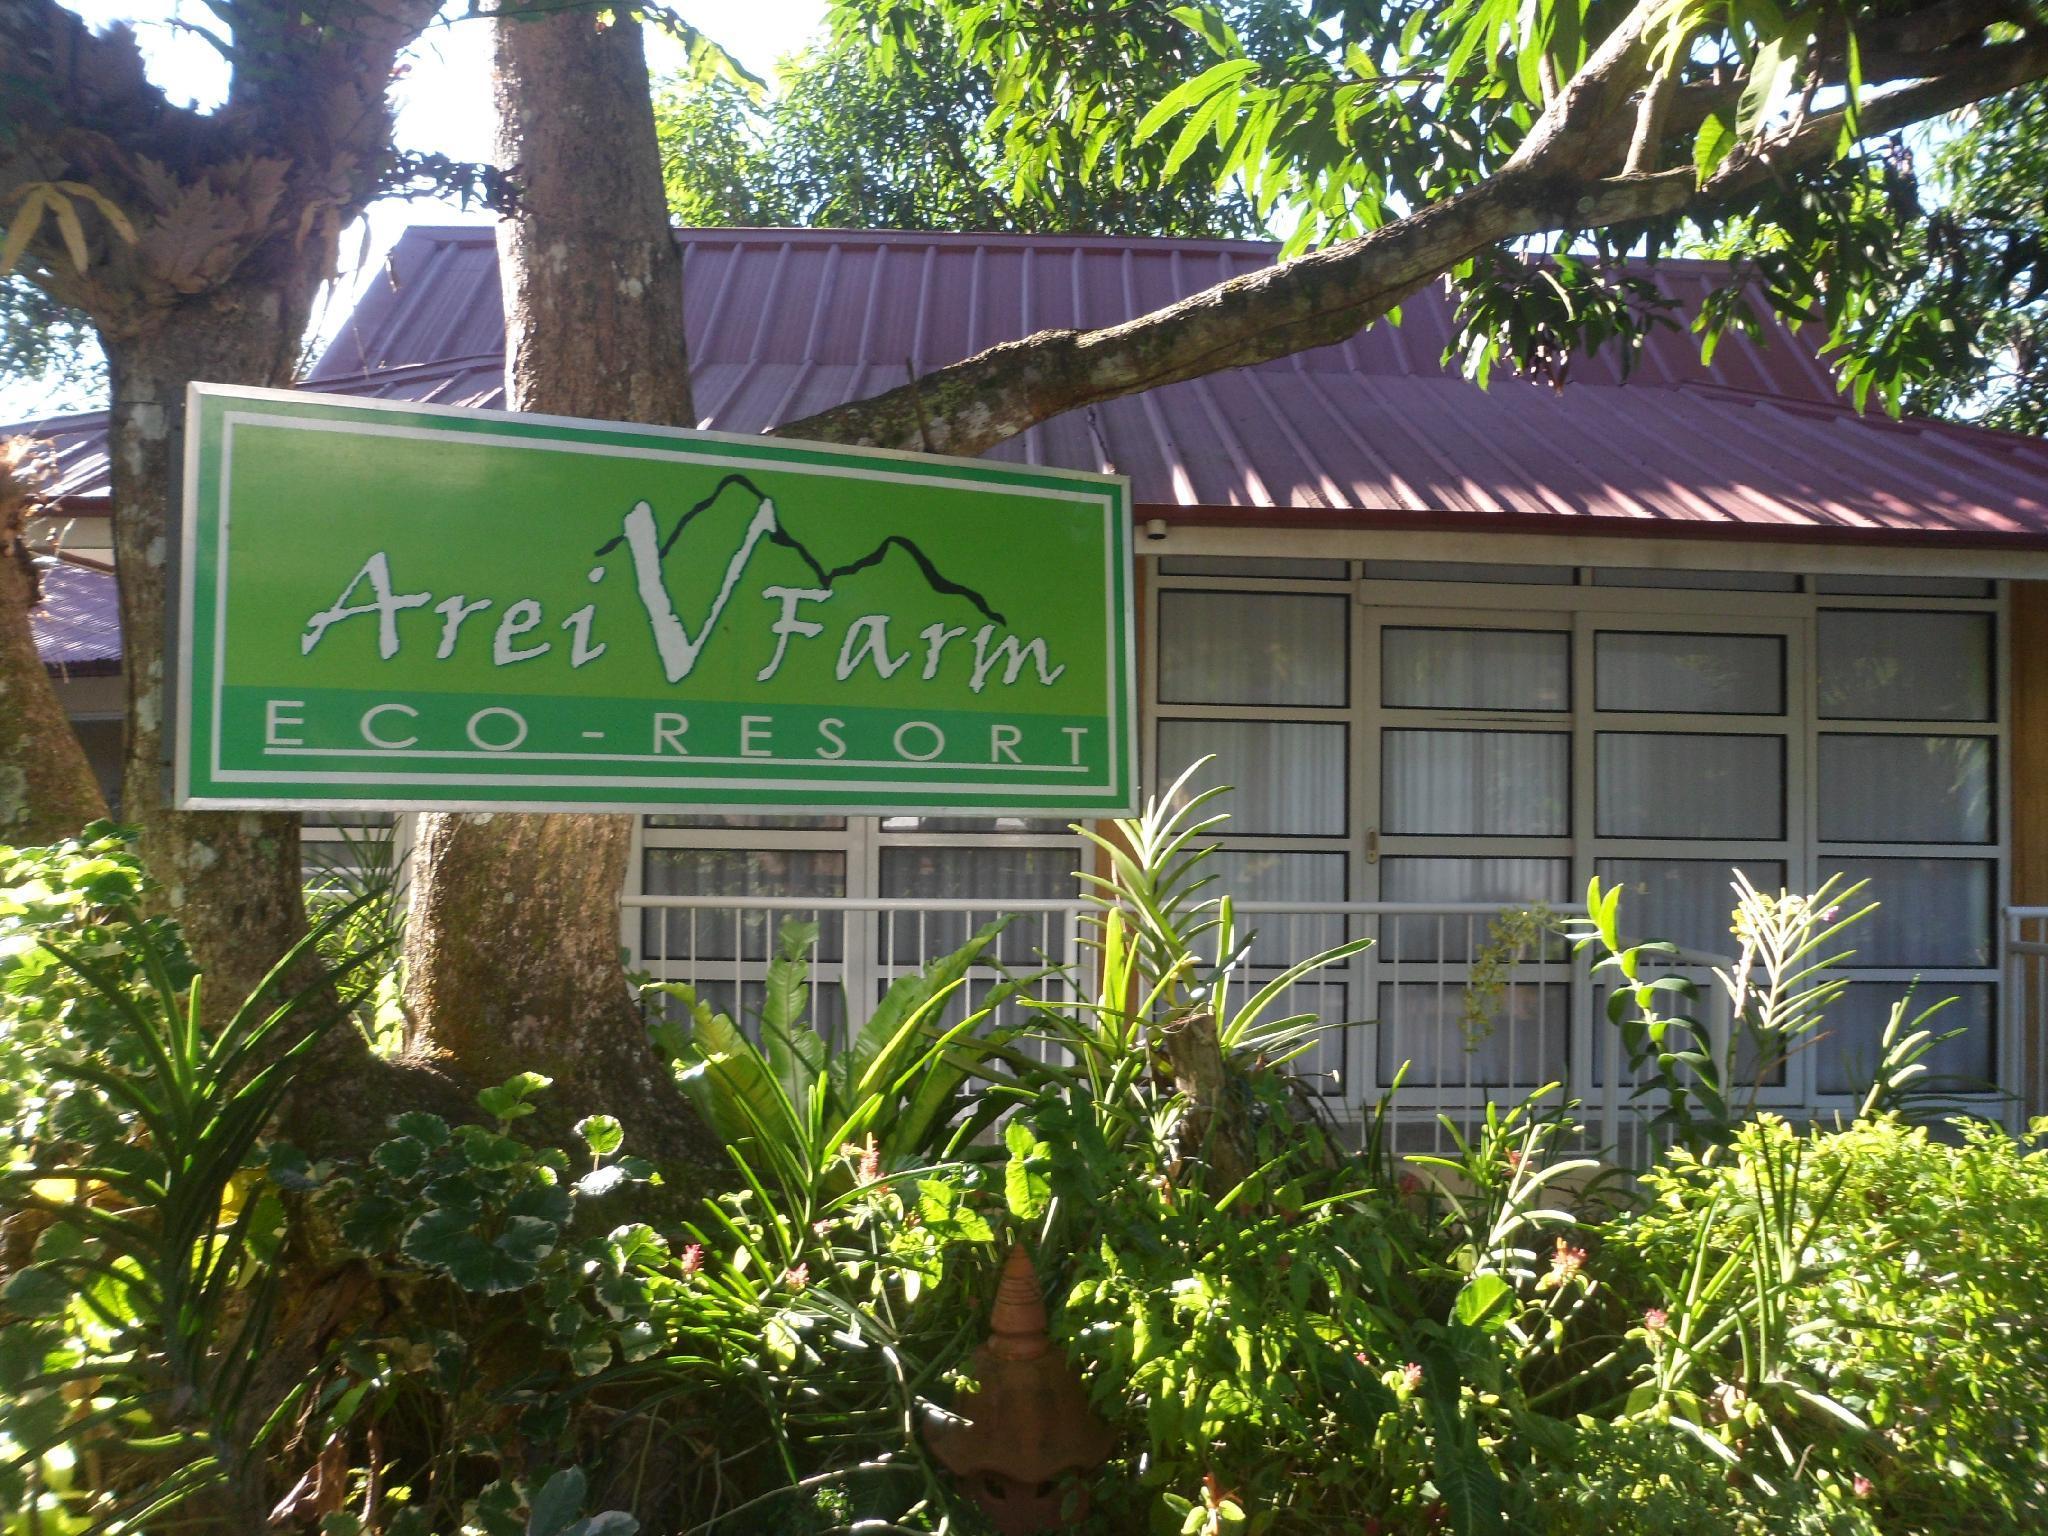 Areiv Farm Eco Resort